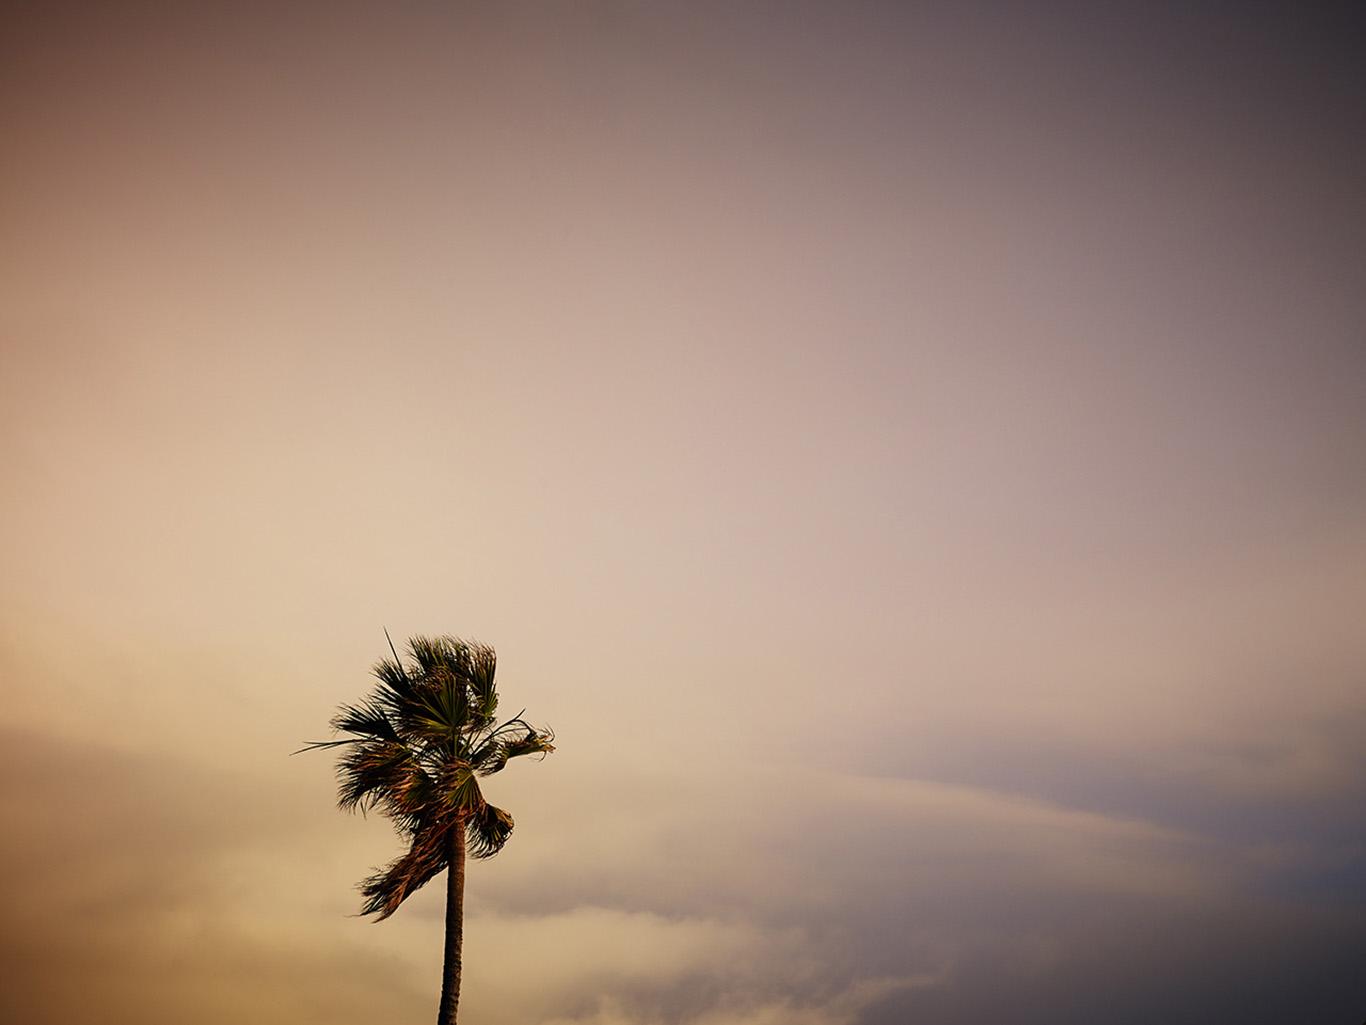 landscape-002.jpg